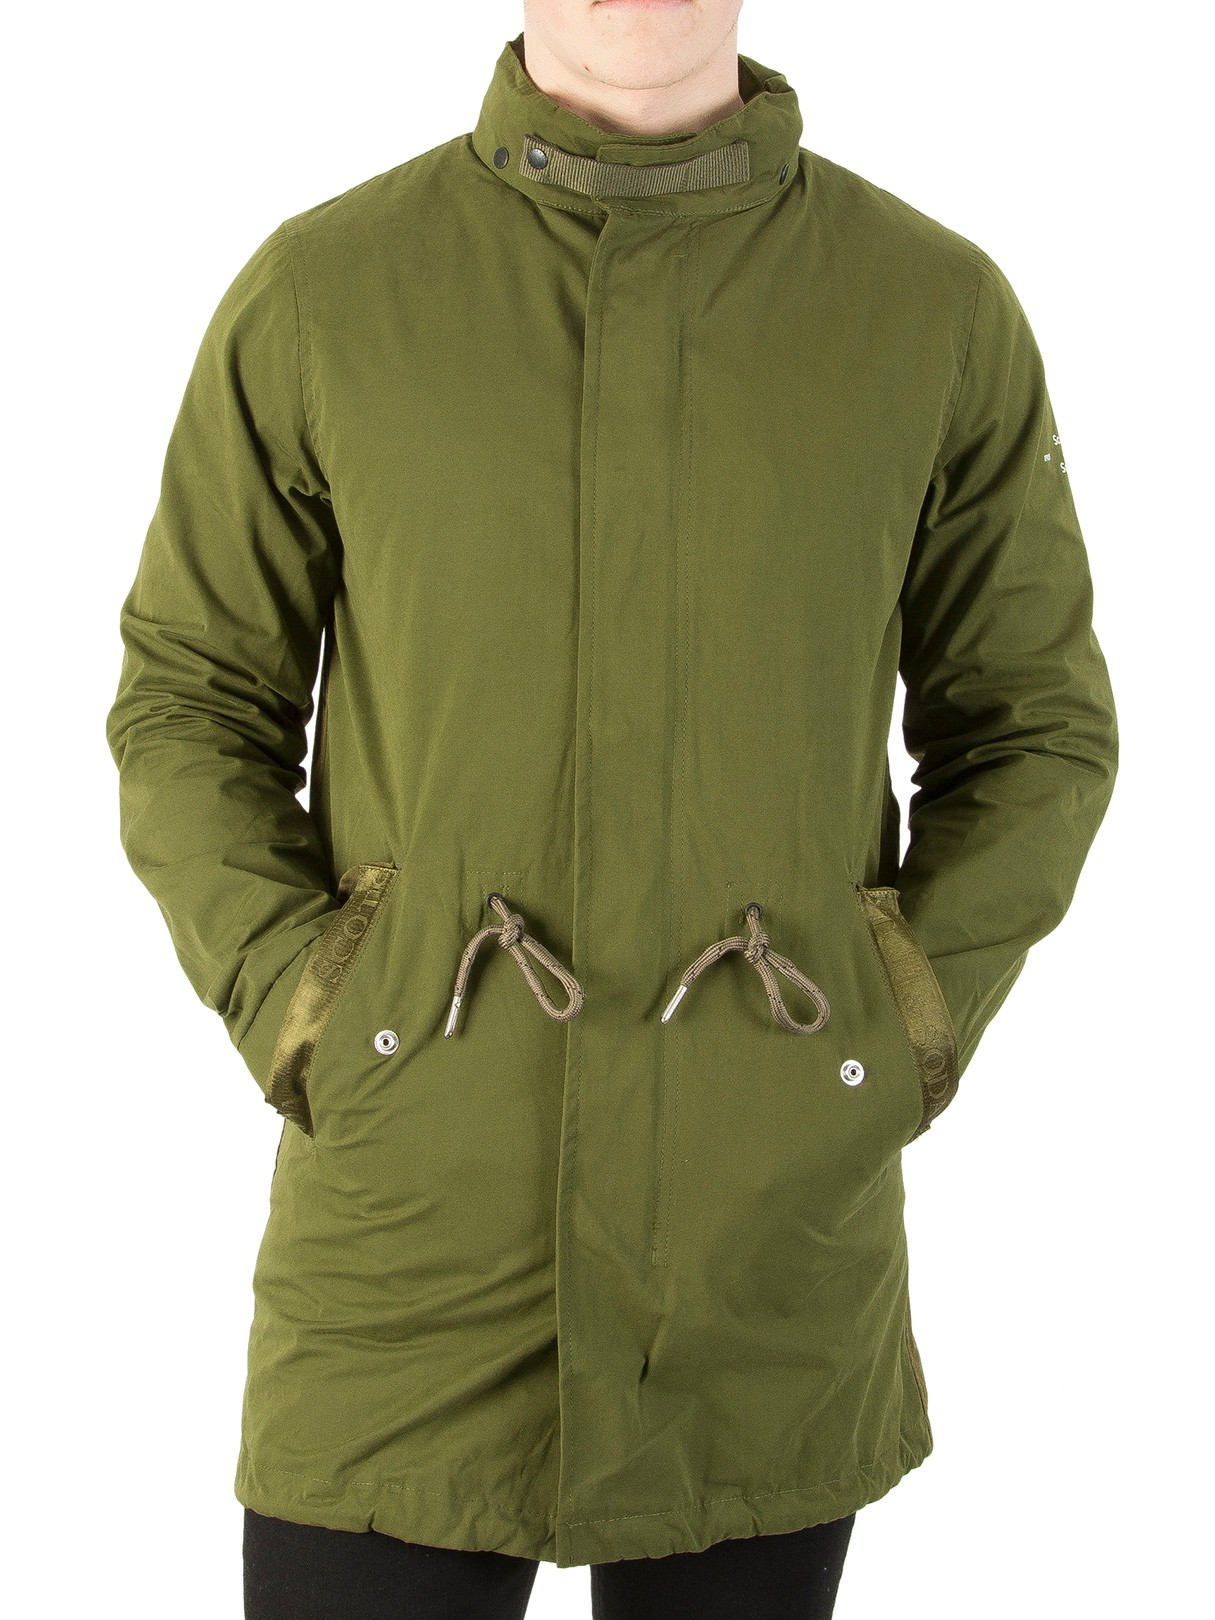 Leather Jackets & Coats|Men's Scotch & Soda Military Long Hooded Parka Jacket